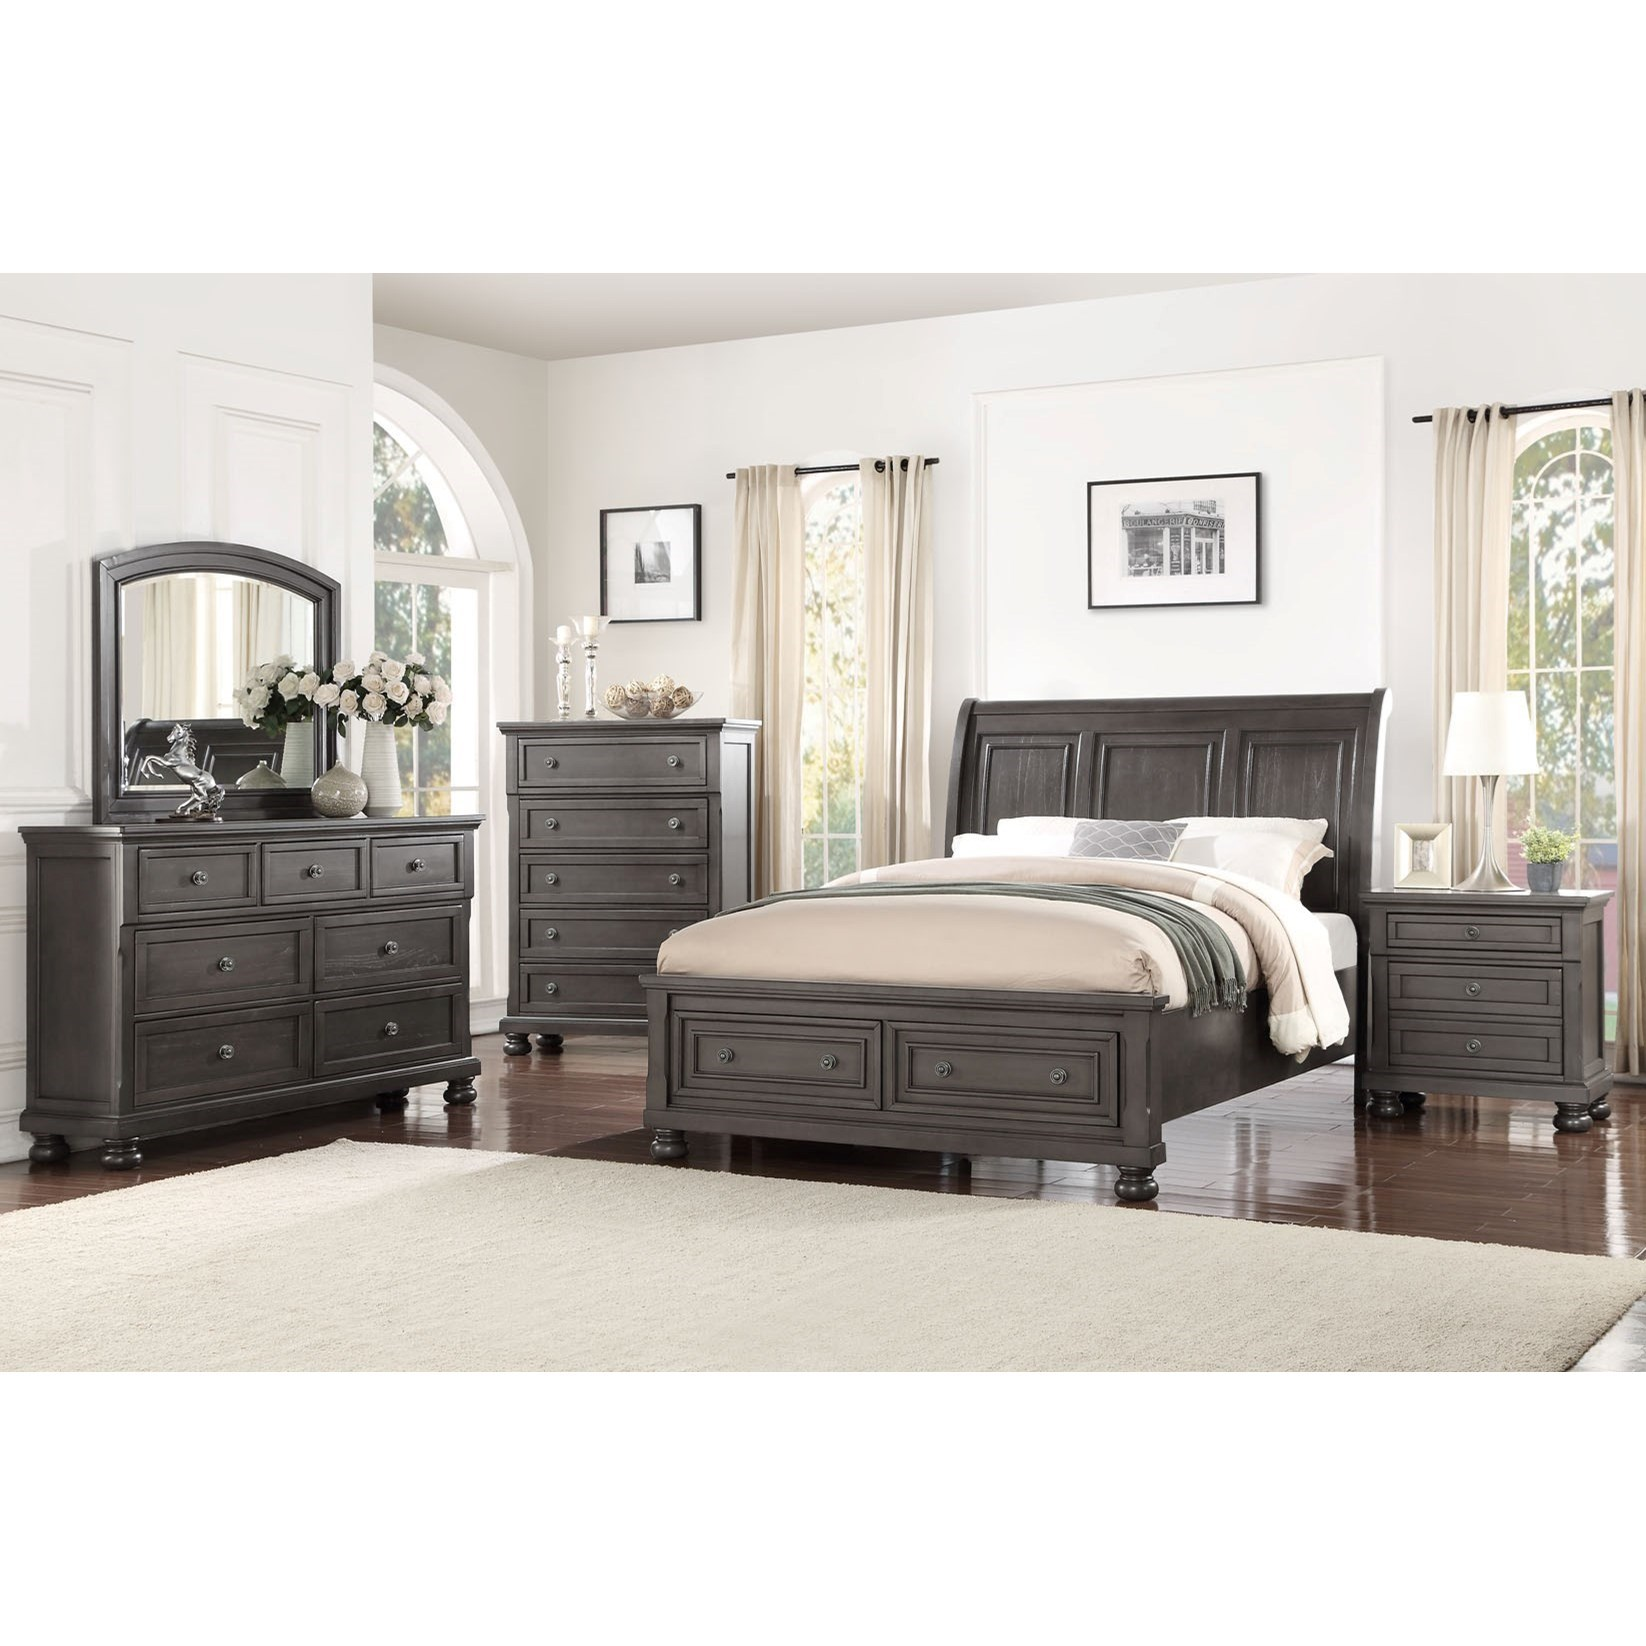 Avalon Furniture Sophia B01061 Queen Bedroom Group Item Number Q 1